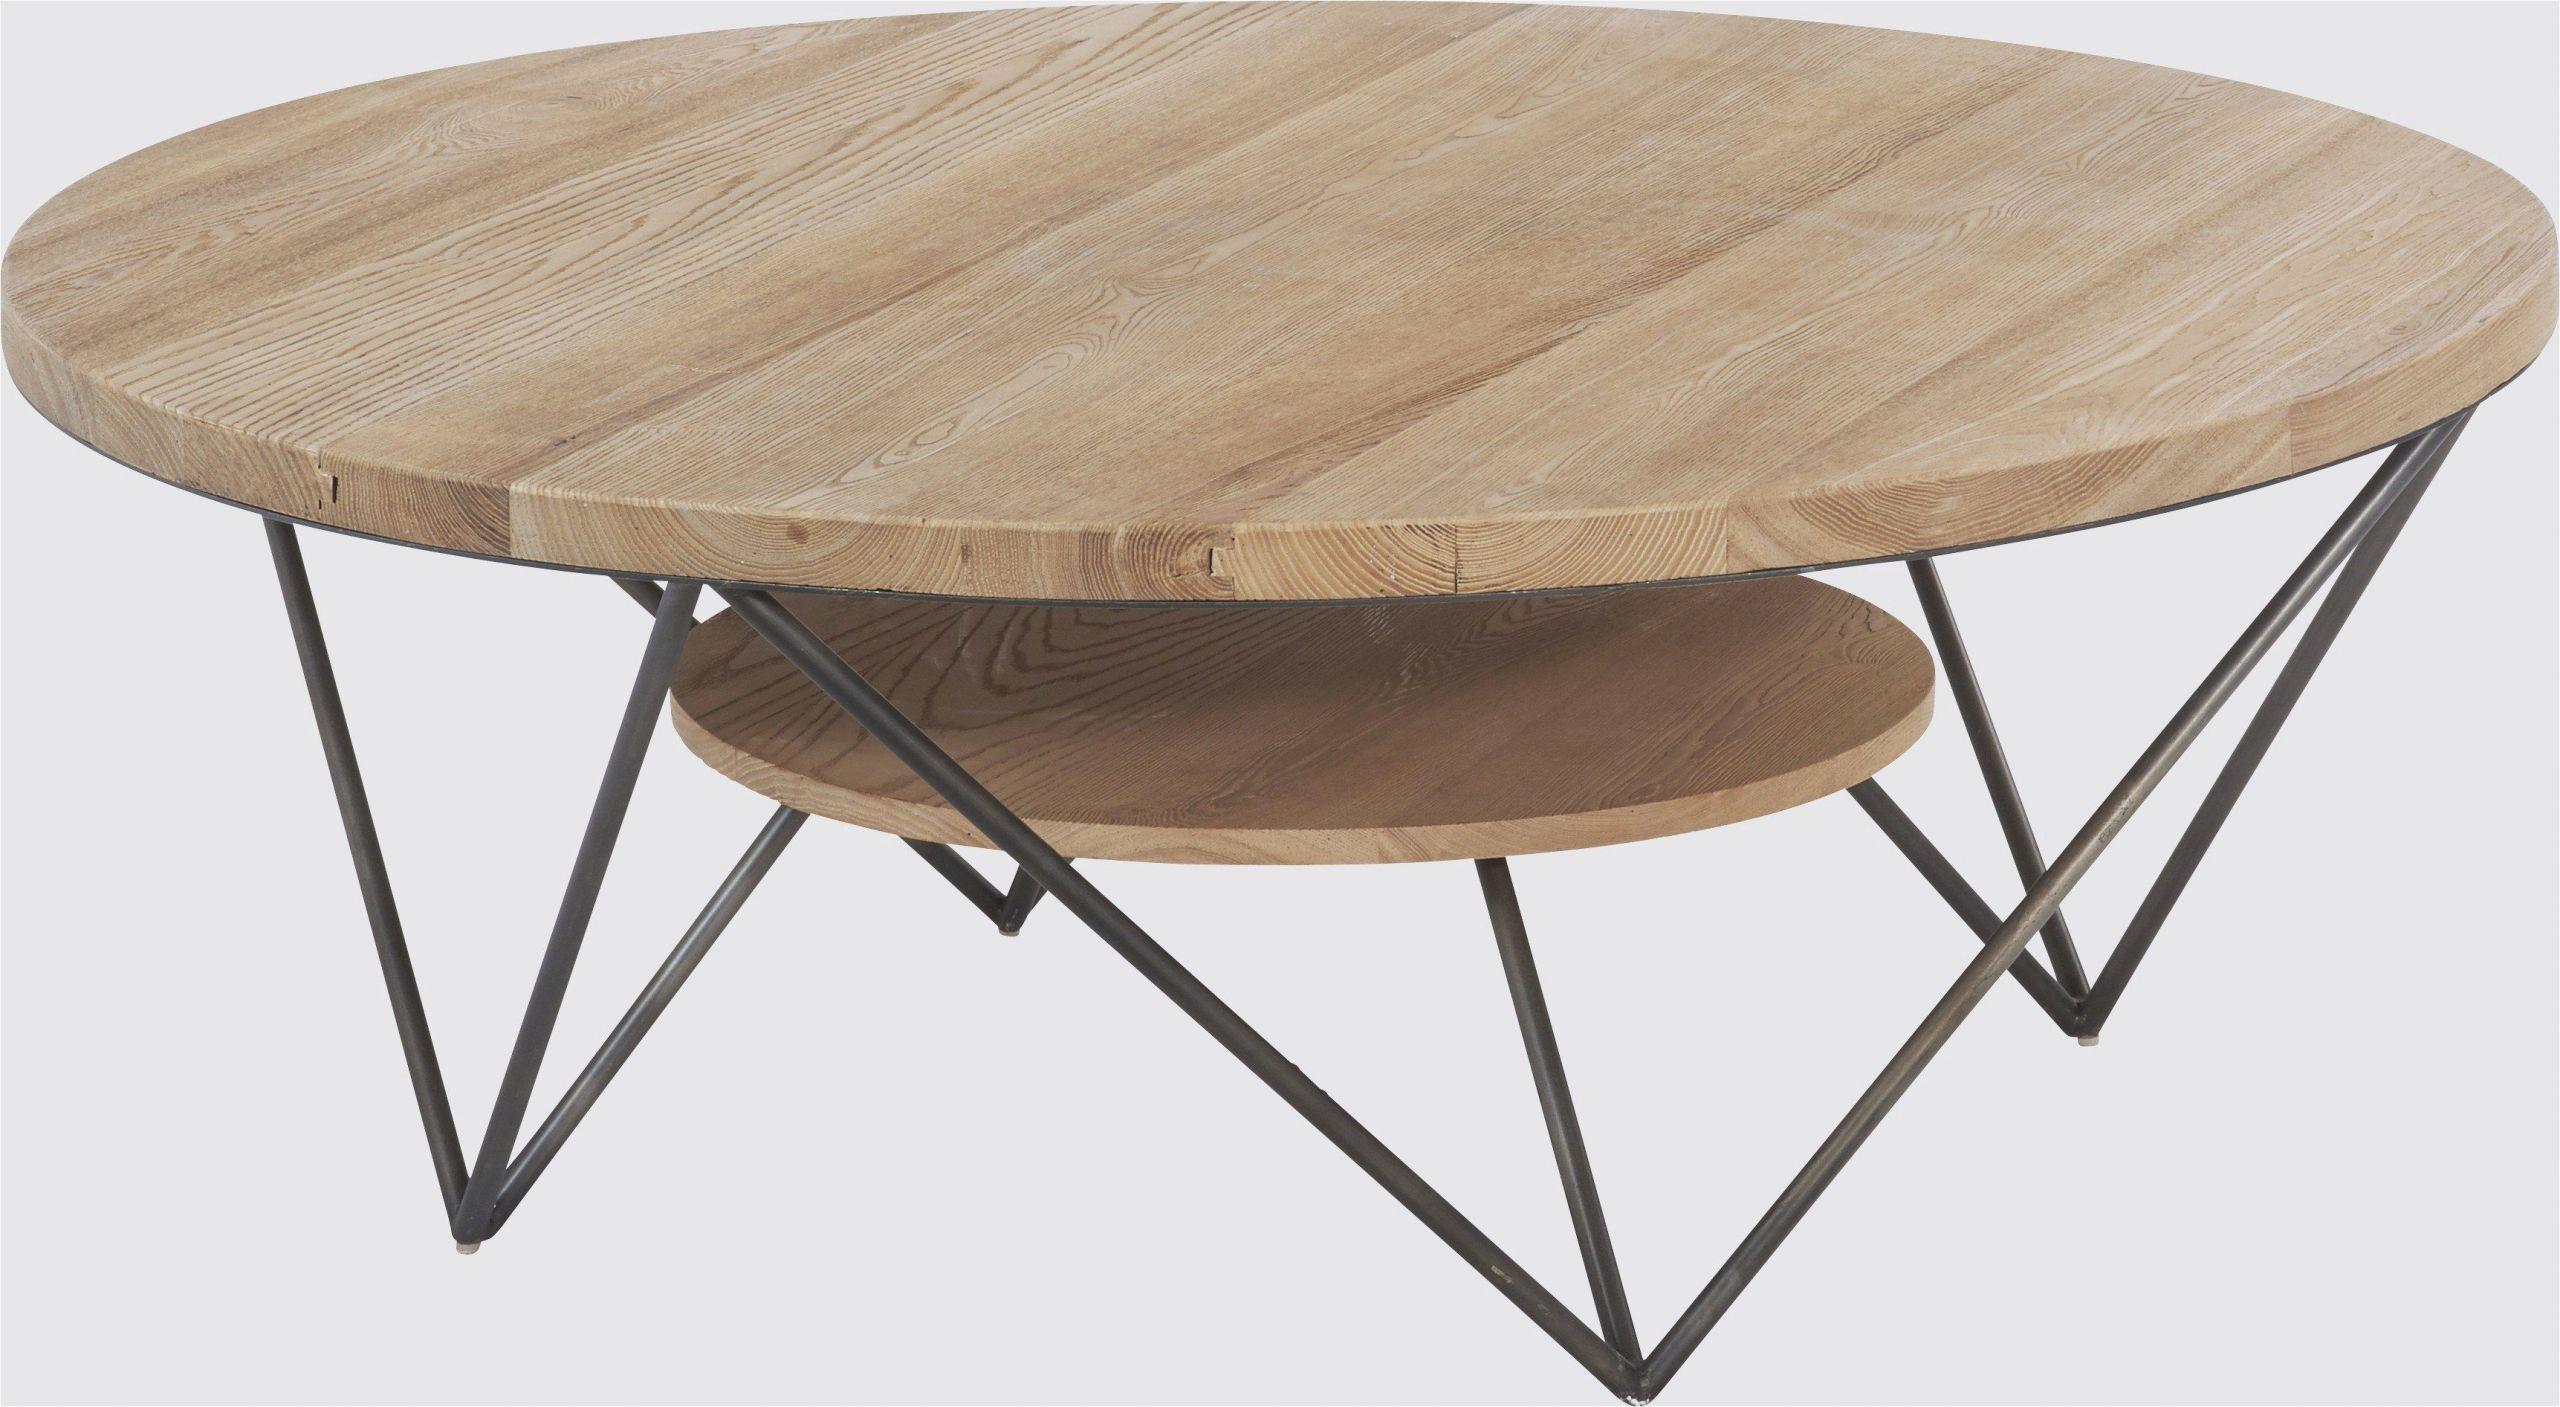 table rallonge papillon luxe table ronde jardin recursiveuniverse conception de jardin of table rallonge papillon